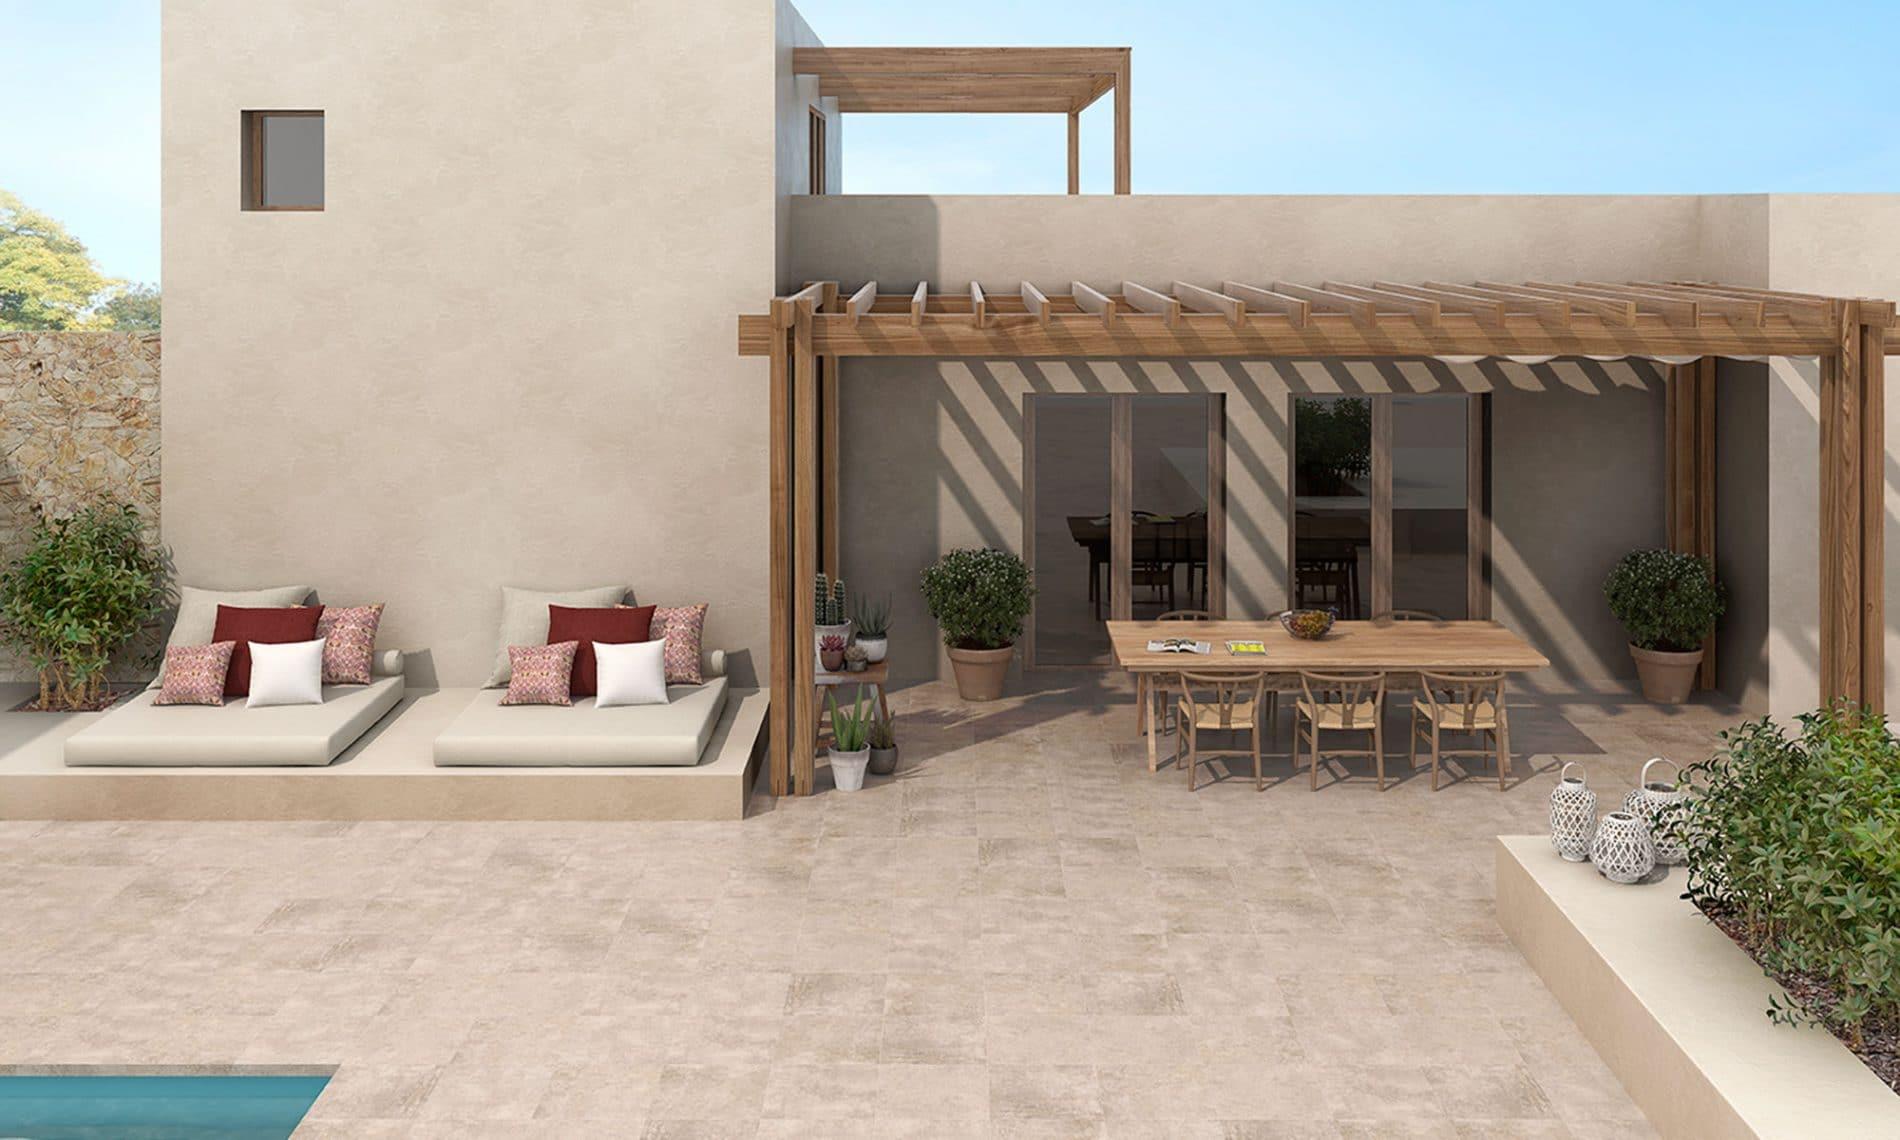 Ext rieur terrasse piscine balcon david carrelage for Carrelage exterieur terrasse italien